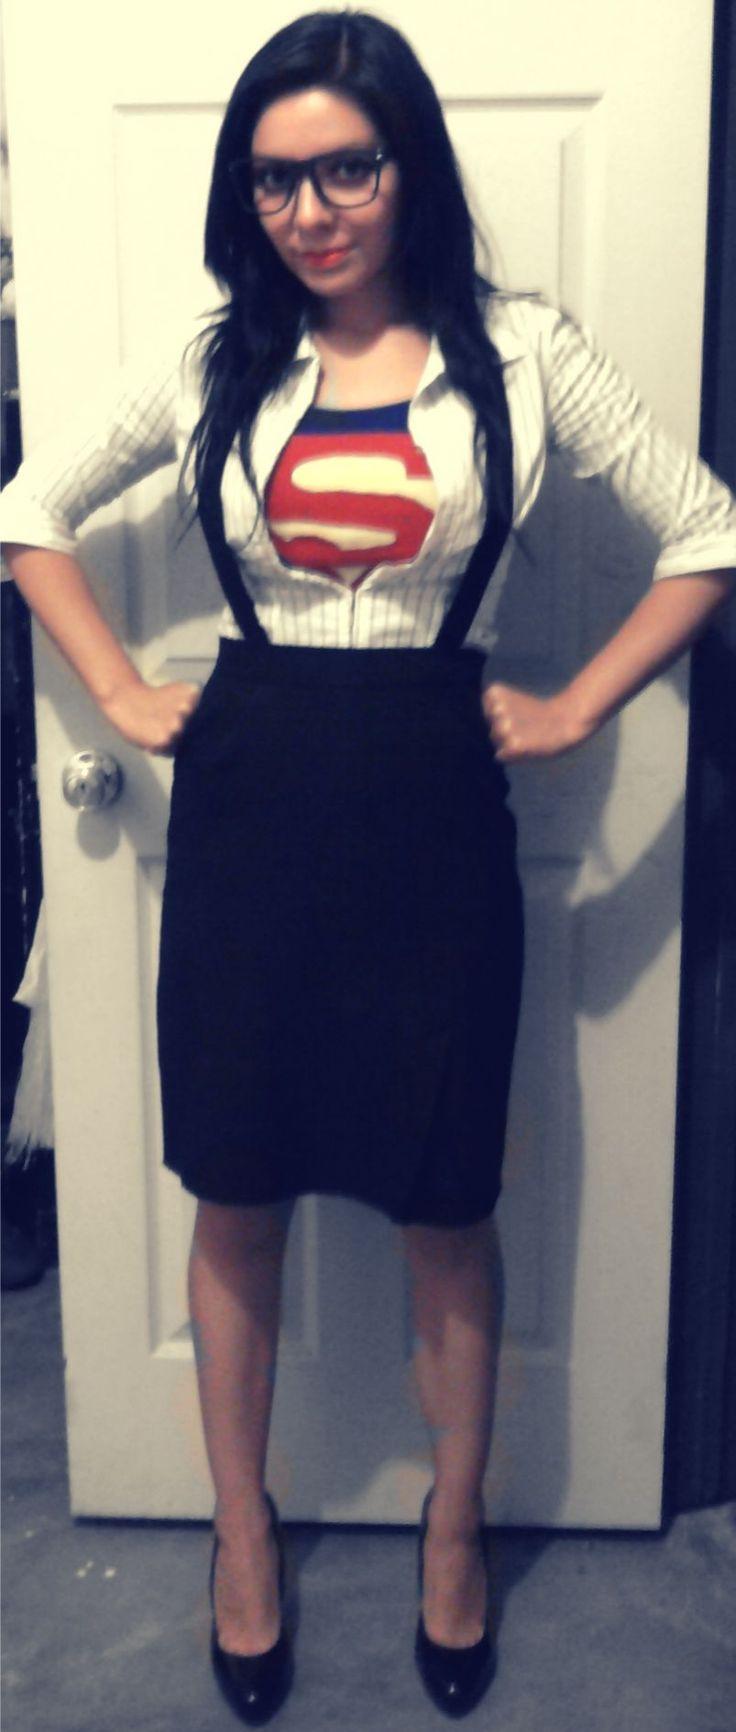 "melyjuku:  Clark Kent - Superman Amazing girl superhero. I'd be happy to welcome a real <a href=""https://hembra.club/"">superhero</a>"